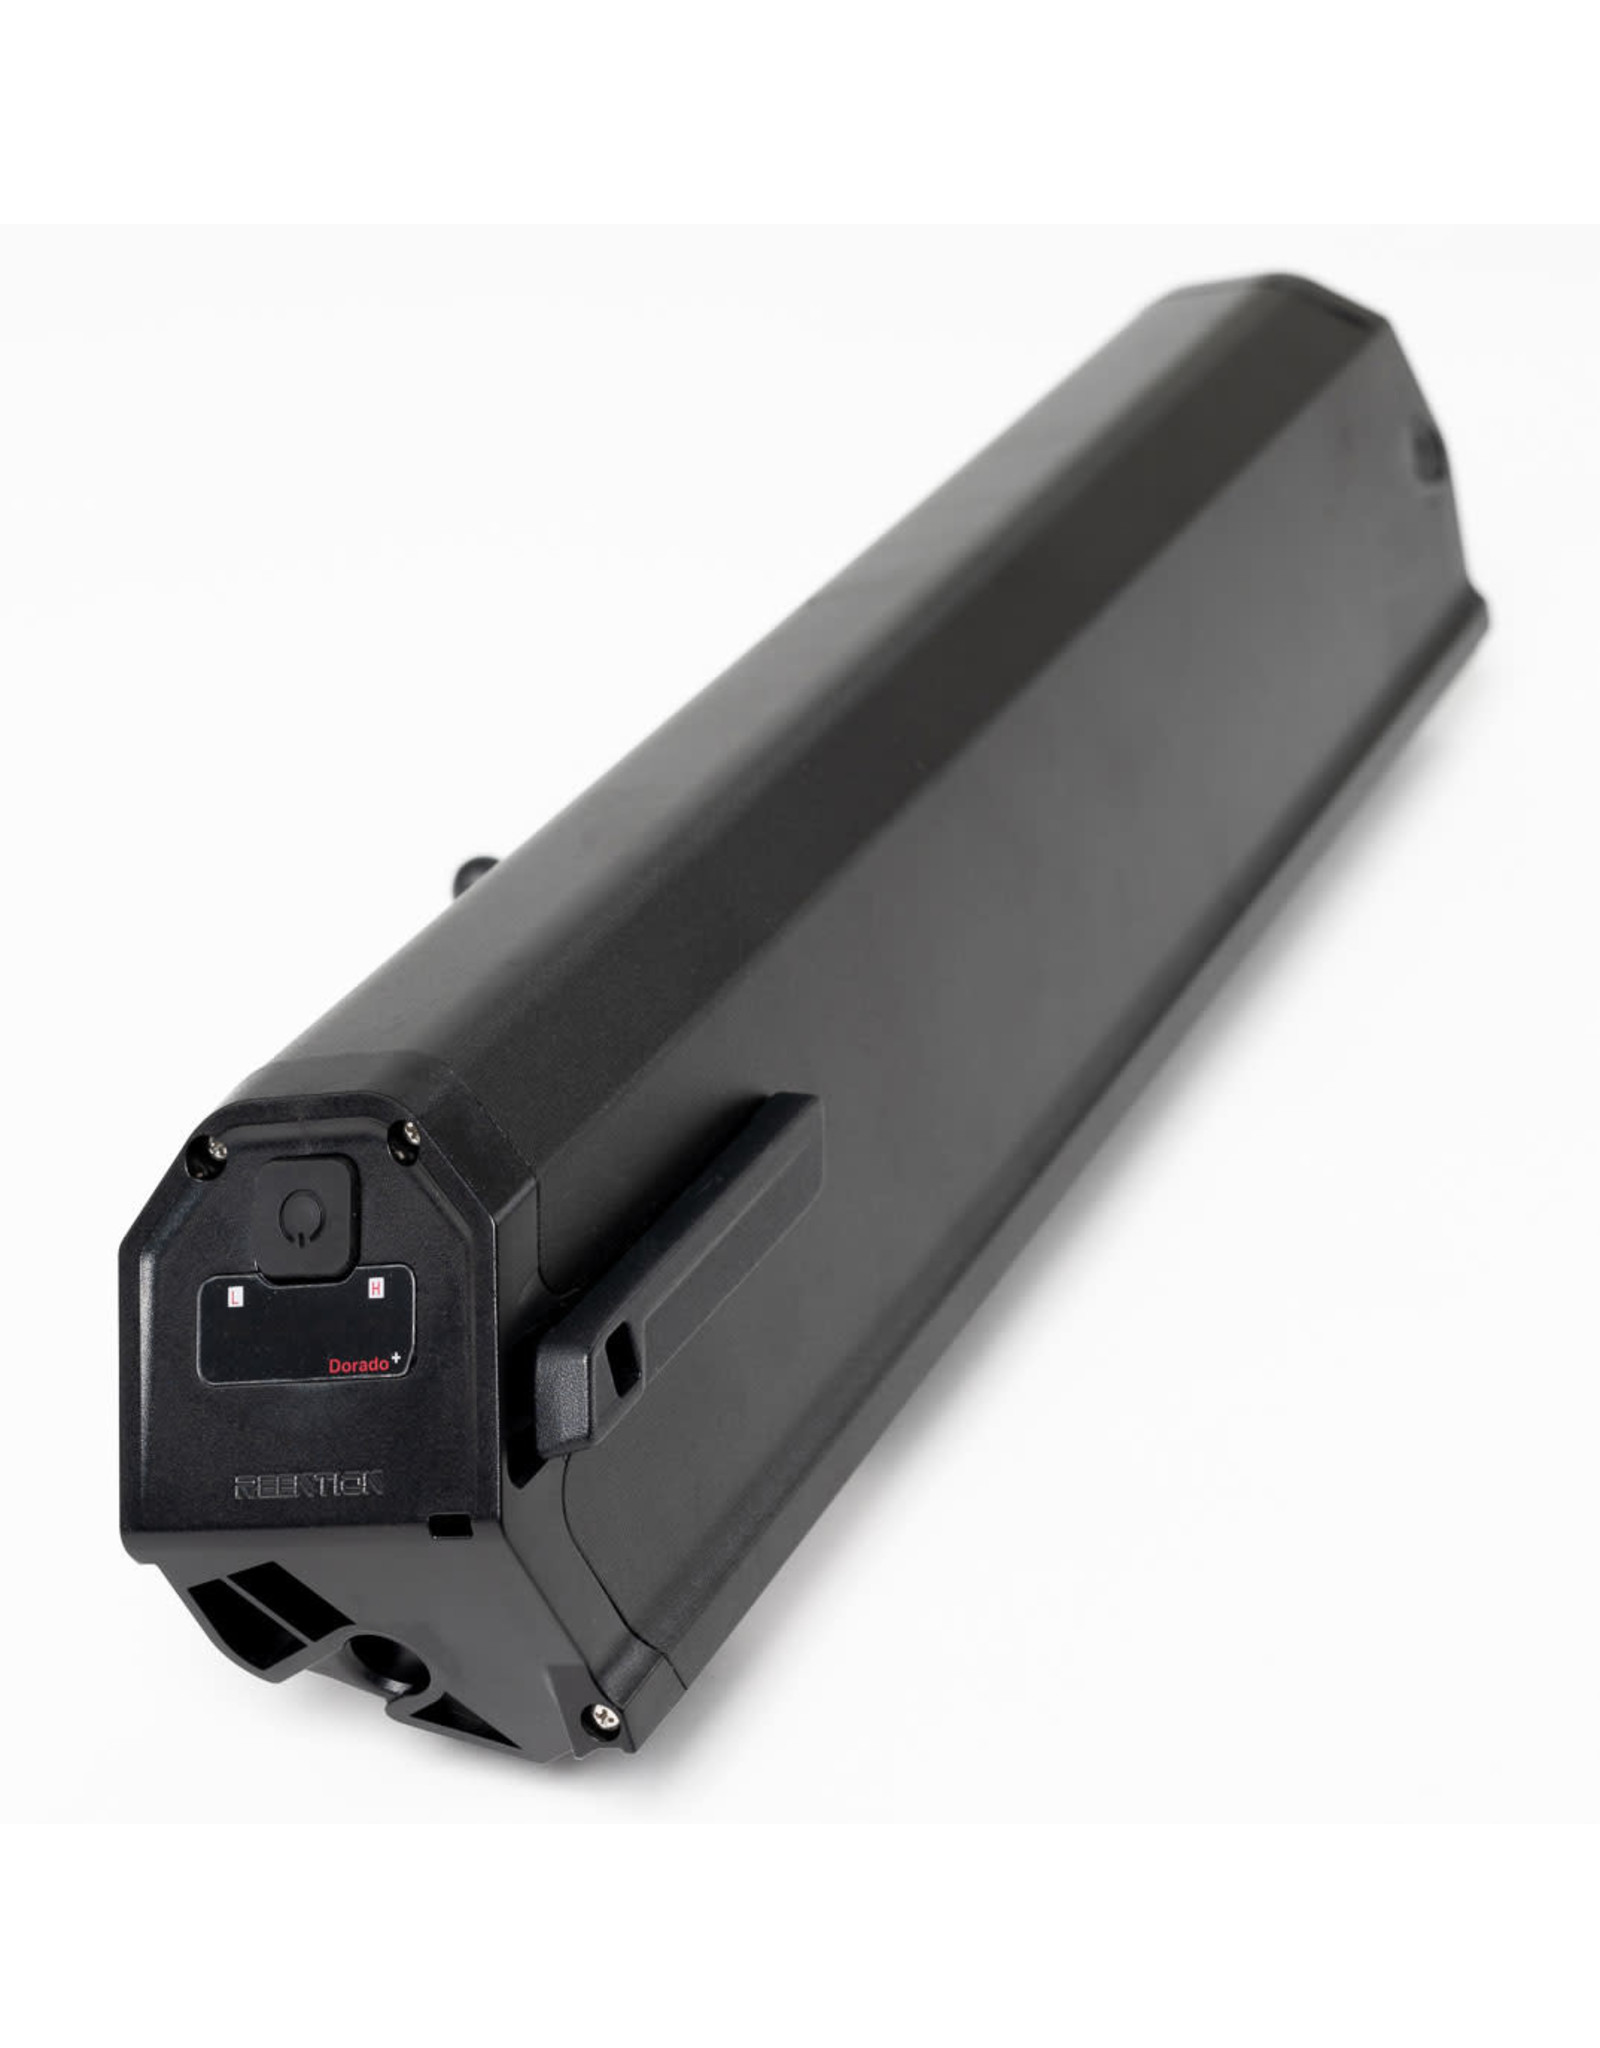 48V, 17.5A Downtube-Mount Battery